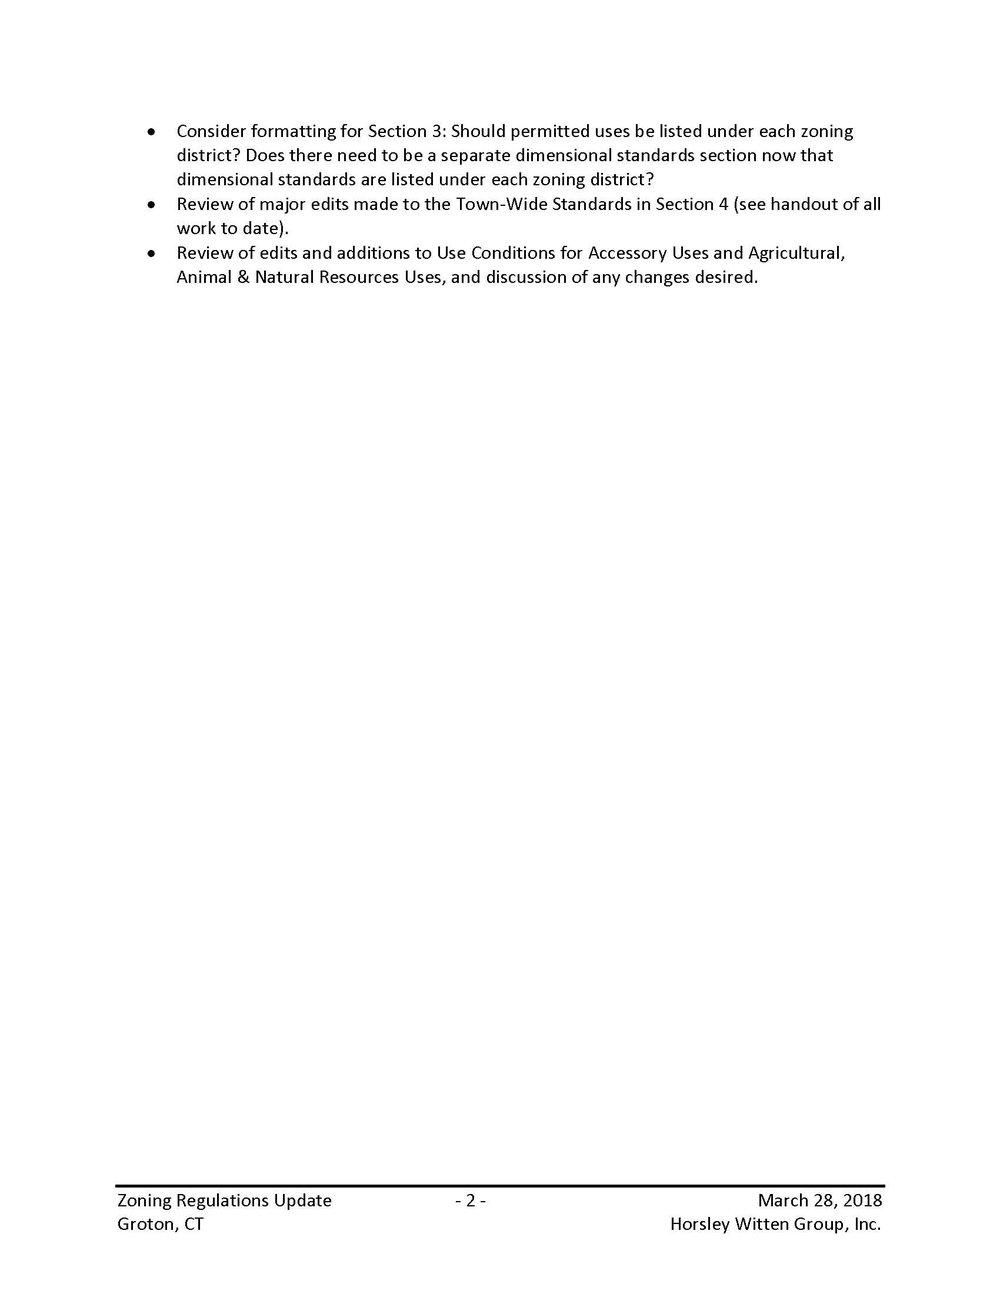 180328_ZCMtg_Memo_16156_Page_2.jpg